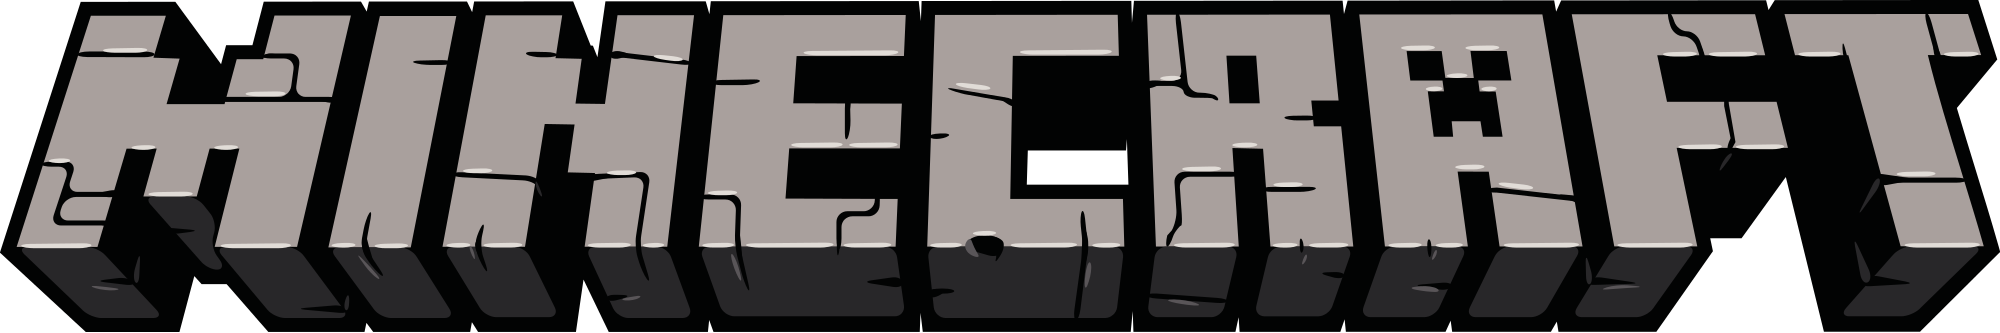 2000pxMinecraft_logo.svg.png (2000×333) Craft logo